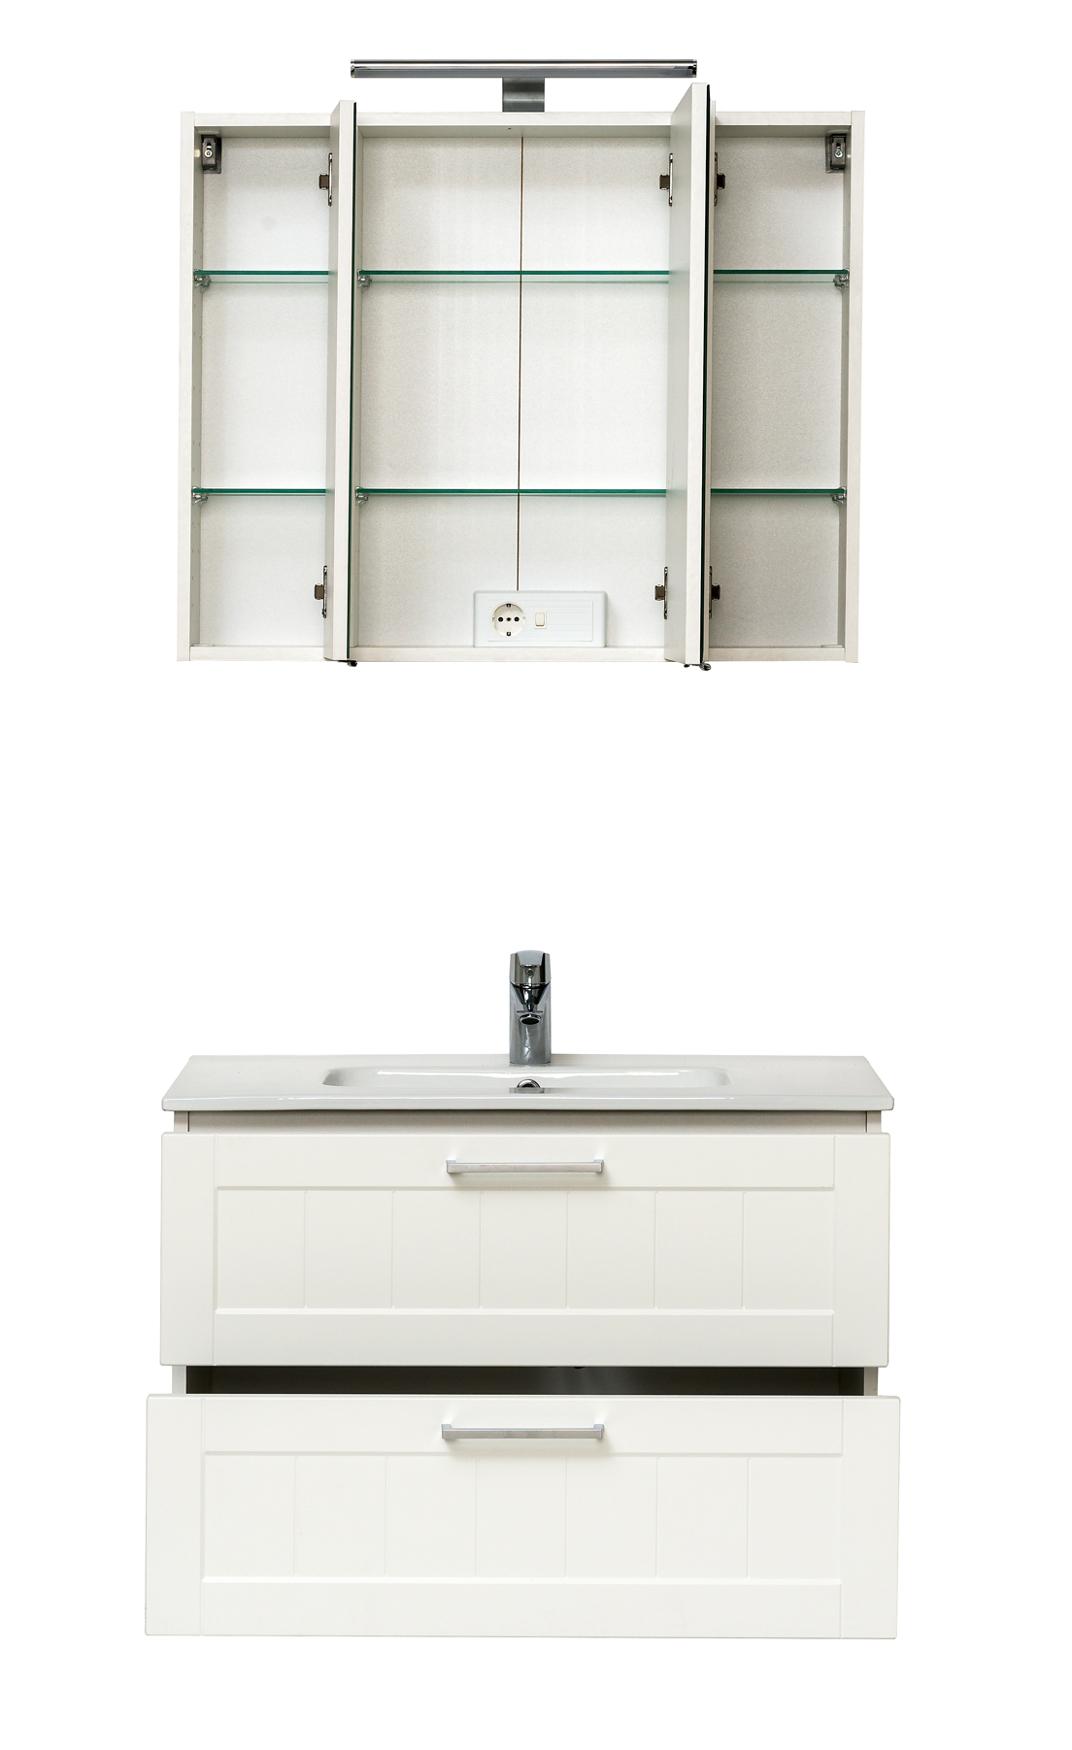 badm bel set barolo mit waschtisch 4 teilig 80 cm breit wei matt bad badm belsets. Black Bedroom Furniture Sets. Home Design Ideas